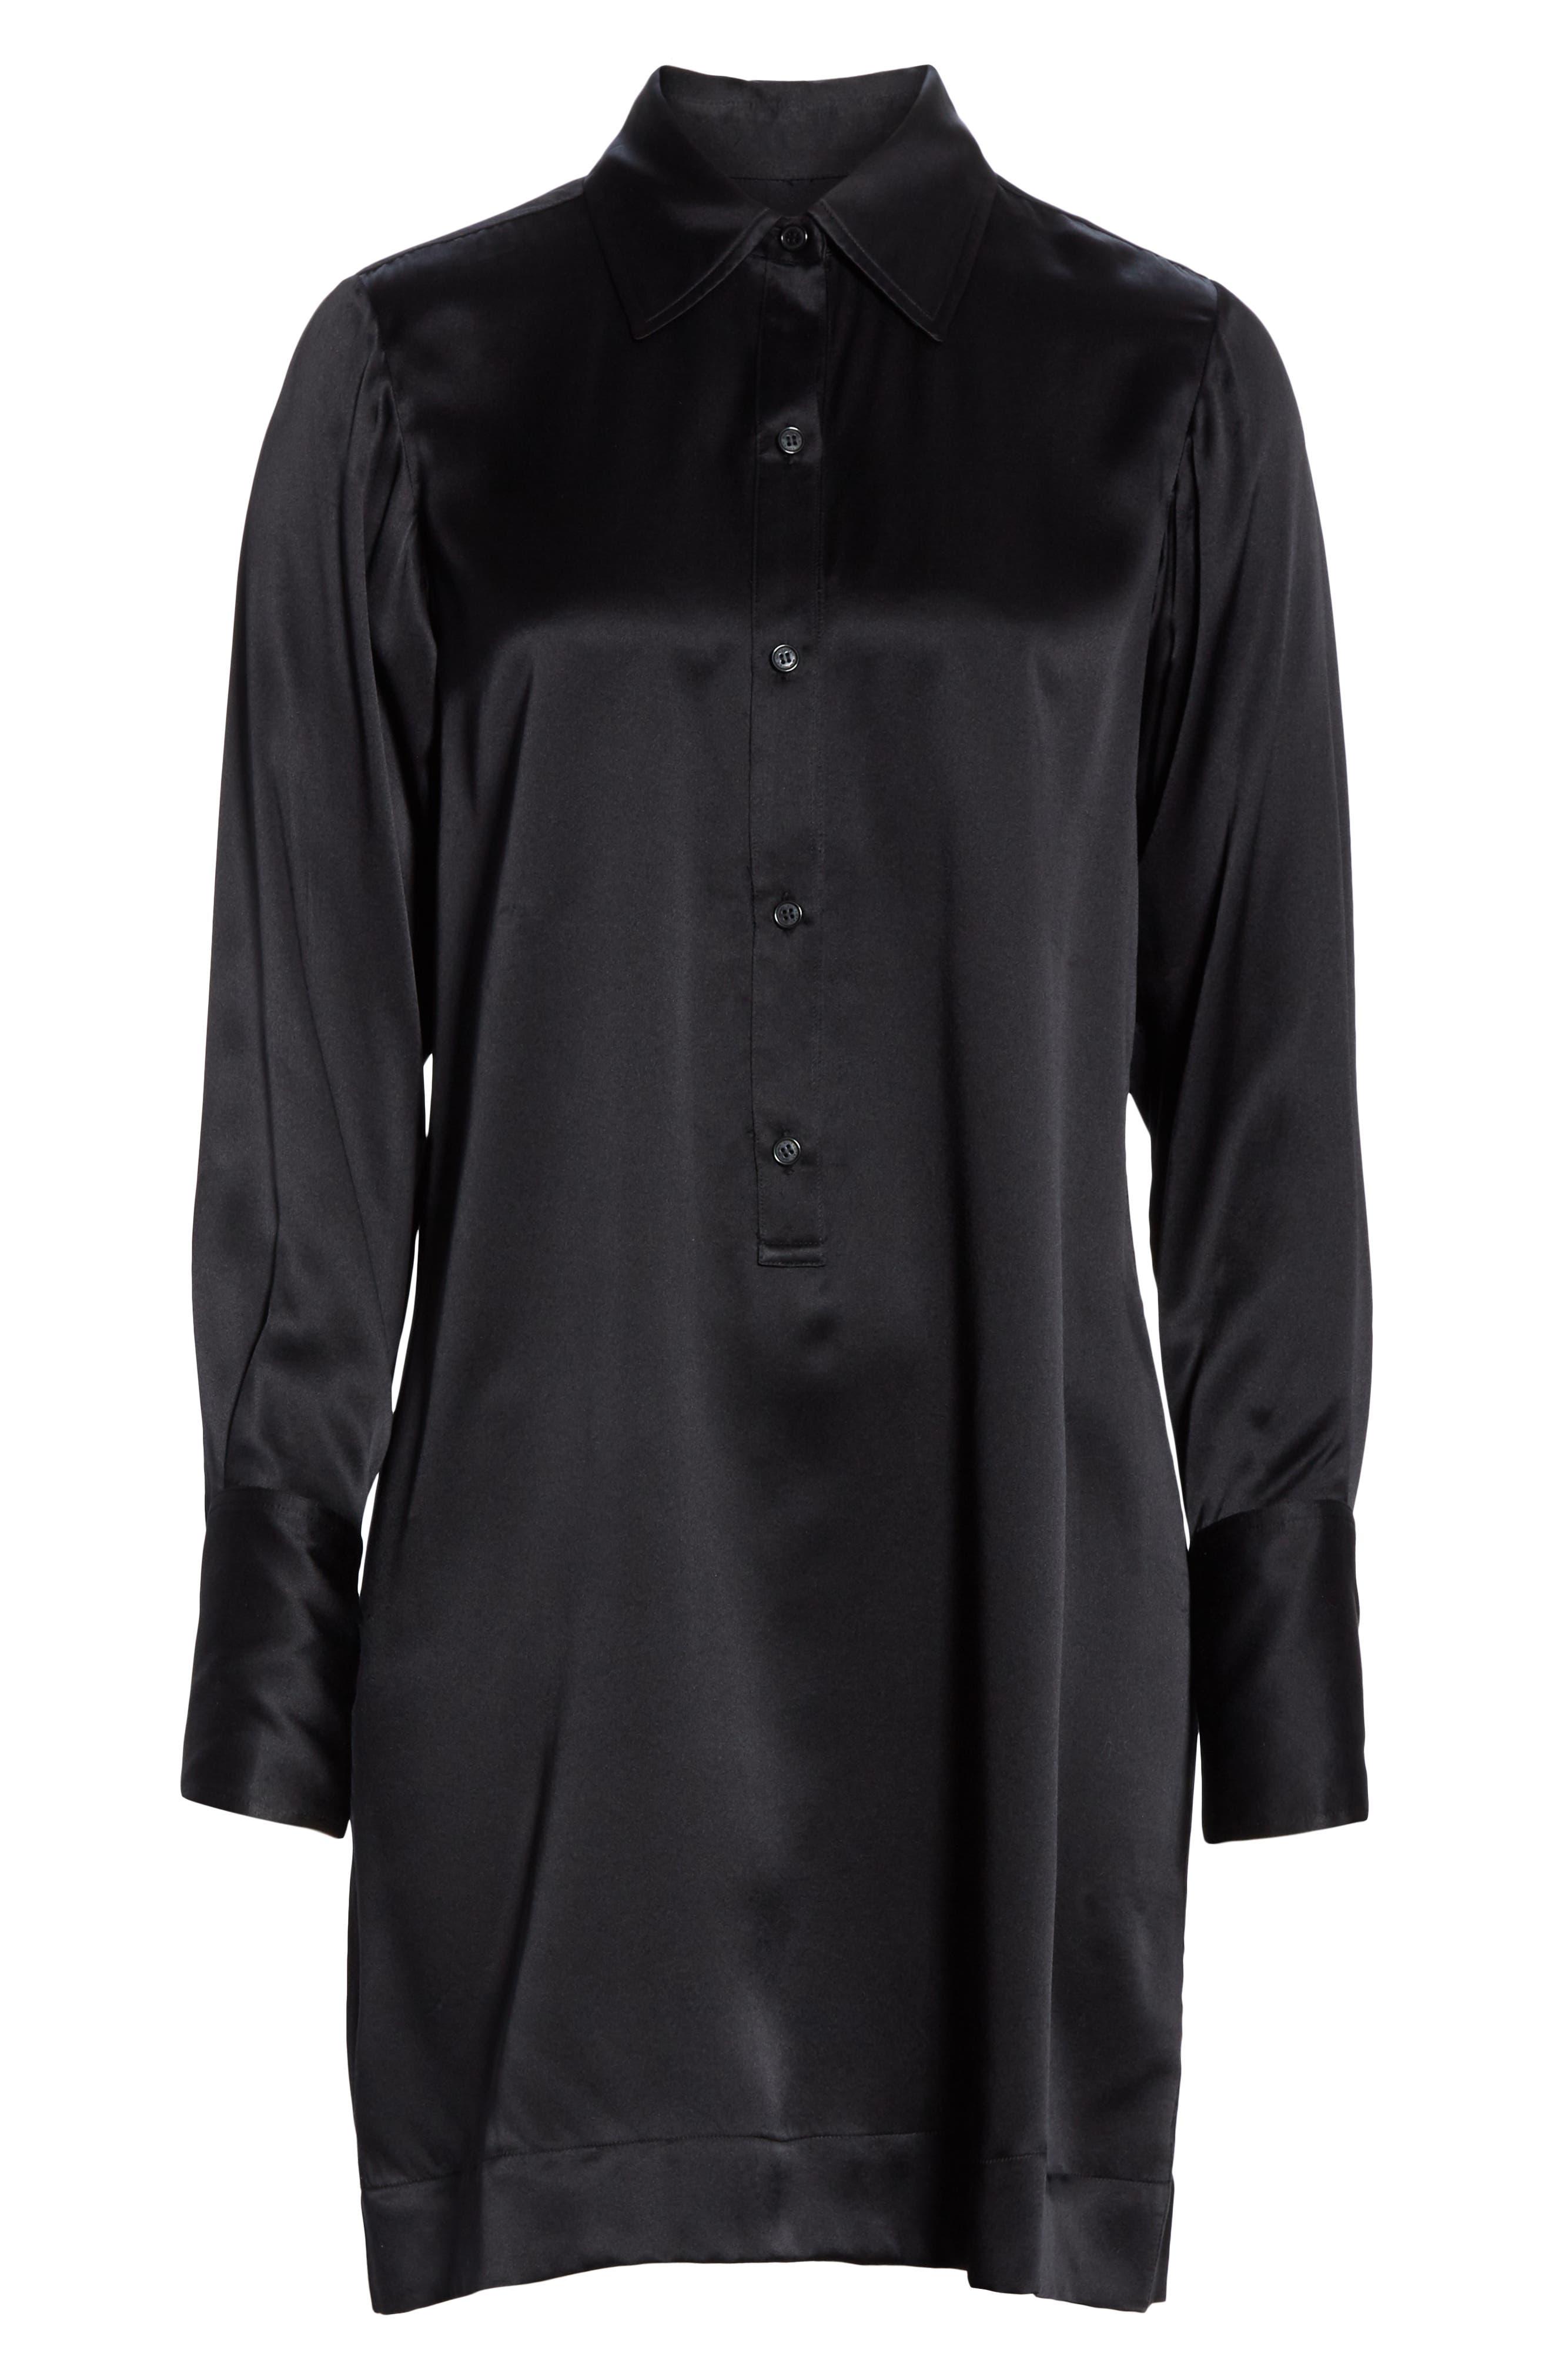 NILI LOTAN, Cassidy Silk Shirtdress, Alternate thumbnail 7, color, BLACK